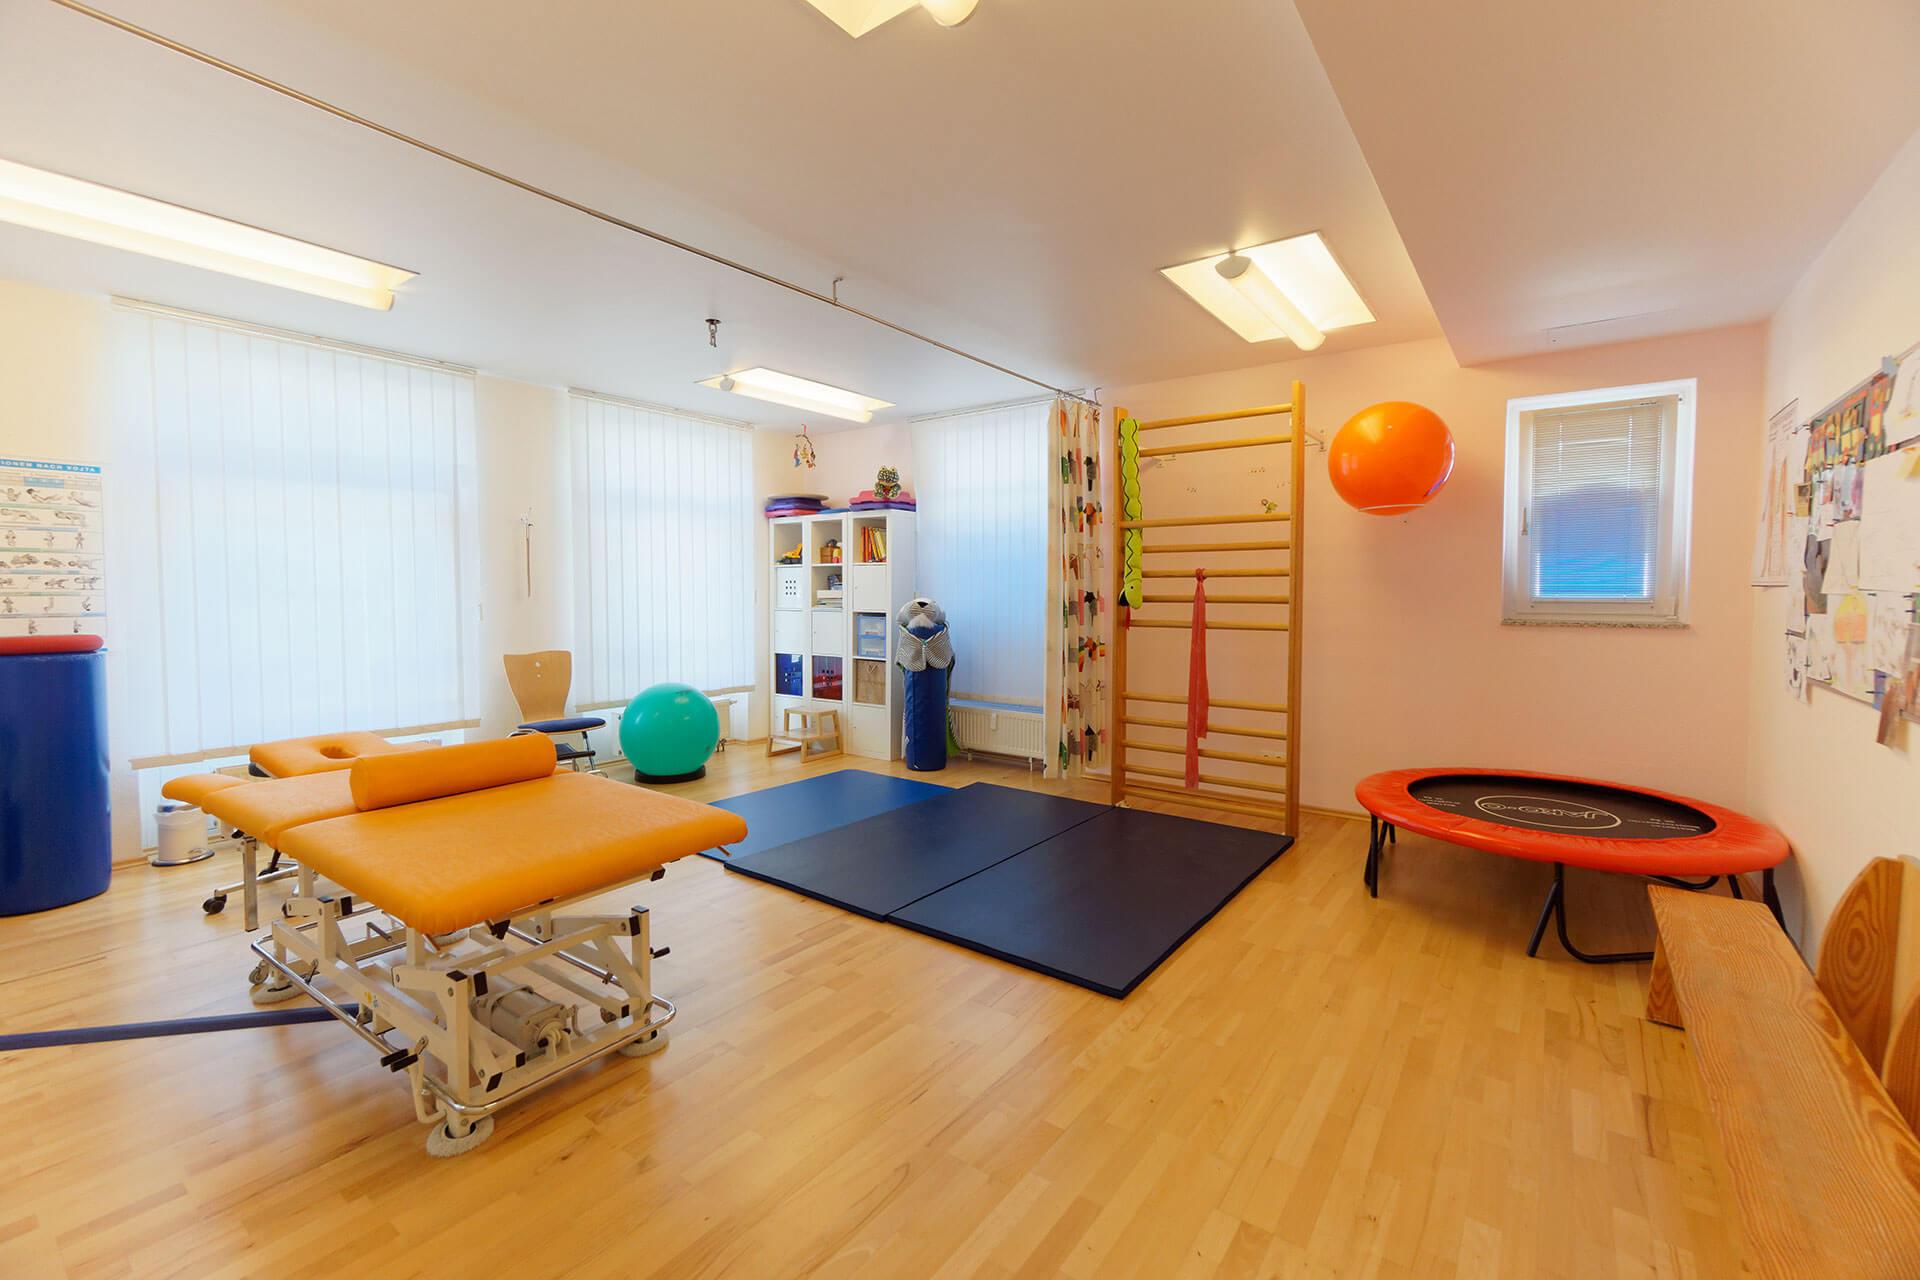 praxis f r physiotherapie krankengymnastik heike hartmann in wolfenb ttel. Black Bedroom Furniture Sets. Home Design Ideas